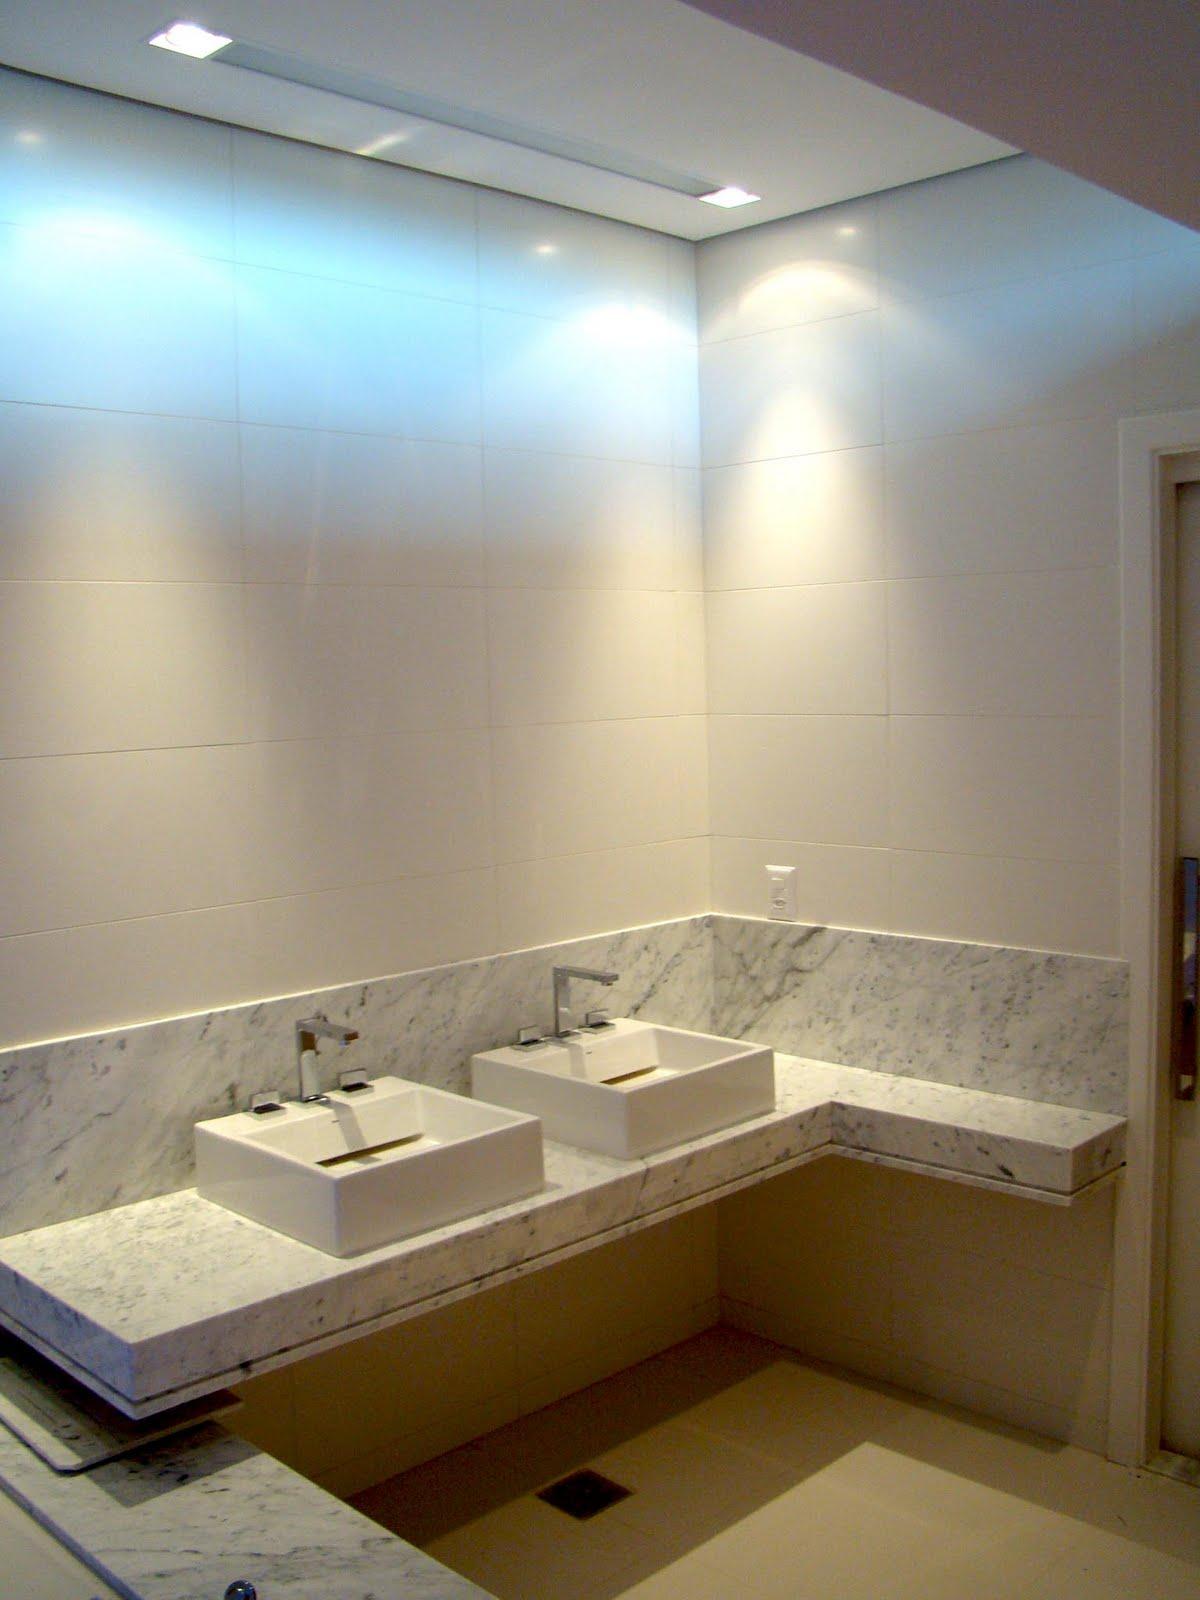 Na área das CUBAS o tampo foi rebaixado para que as cubas (sobrepor  #40290C 1200x1600 Banheiro Bancada Marmore Carrara